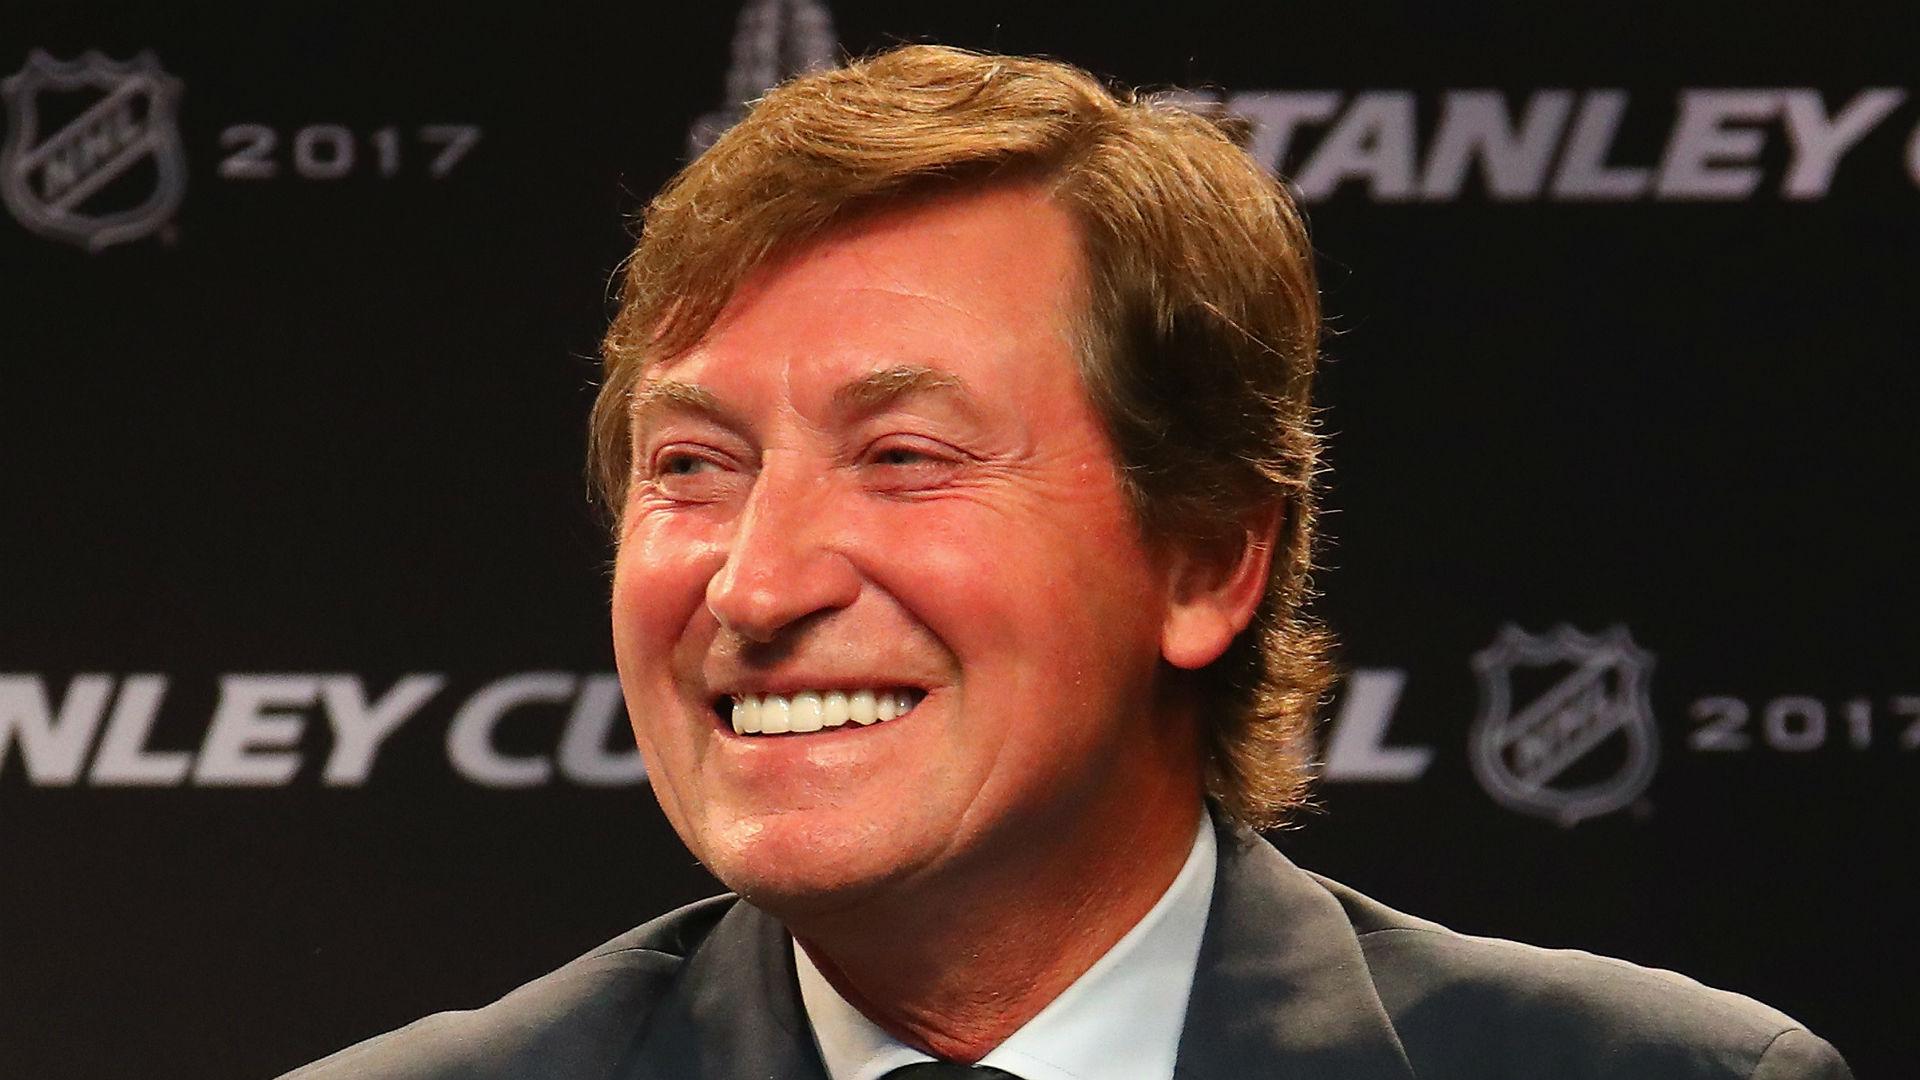 WayneGretzky-111617-GETTY-FTR.jpg